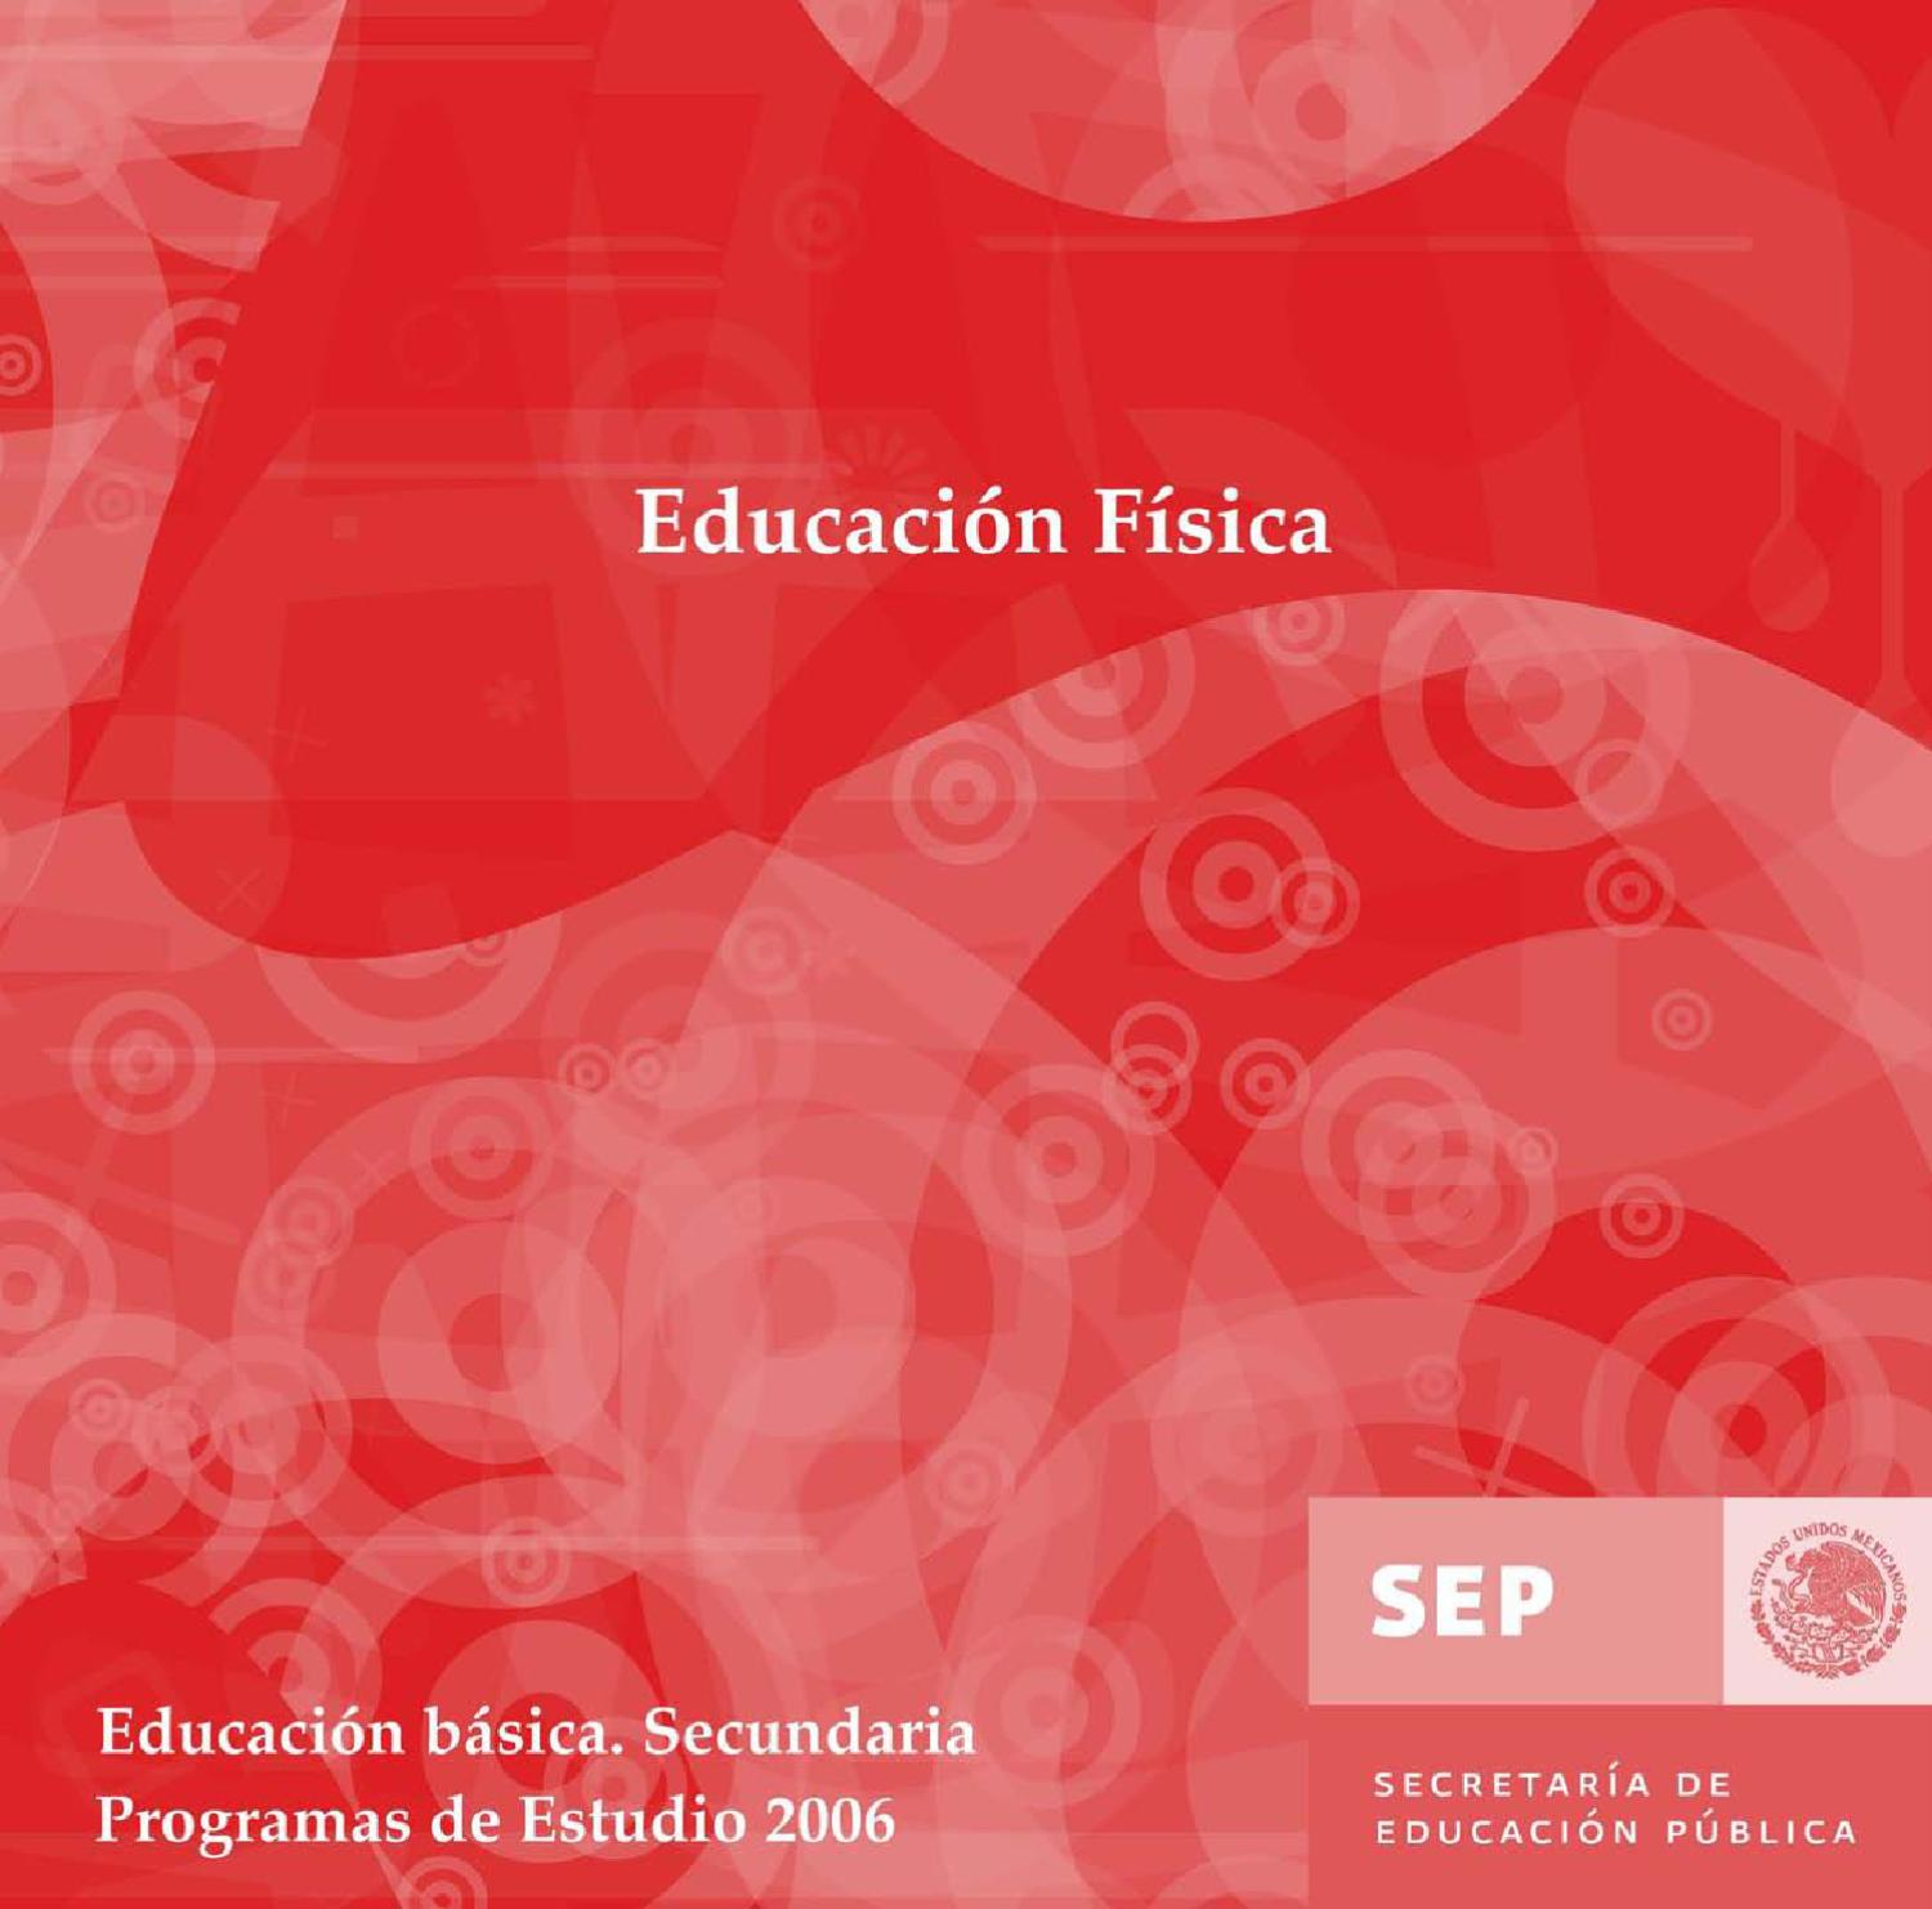 Organize Ideas Issuu Programa De Educaci 243 N F 237 Sica Para Secundaria By